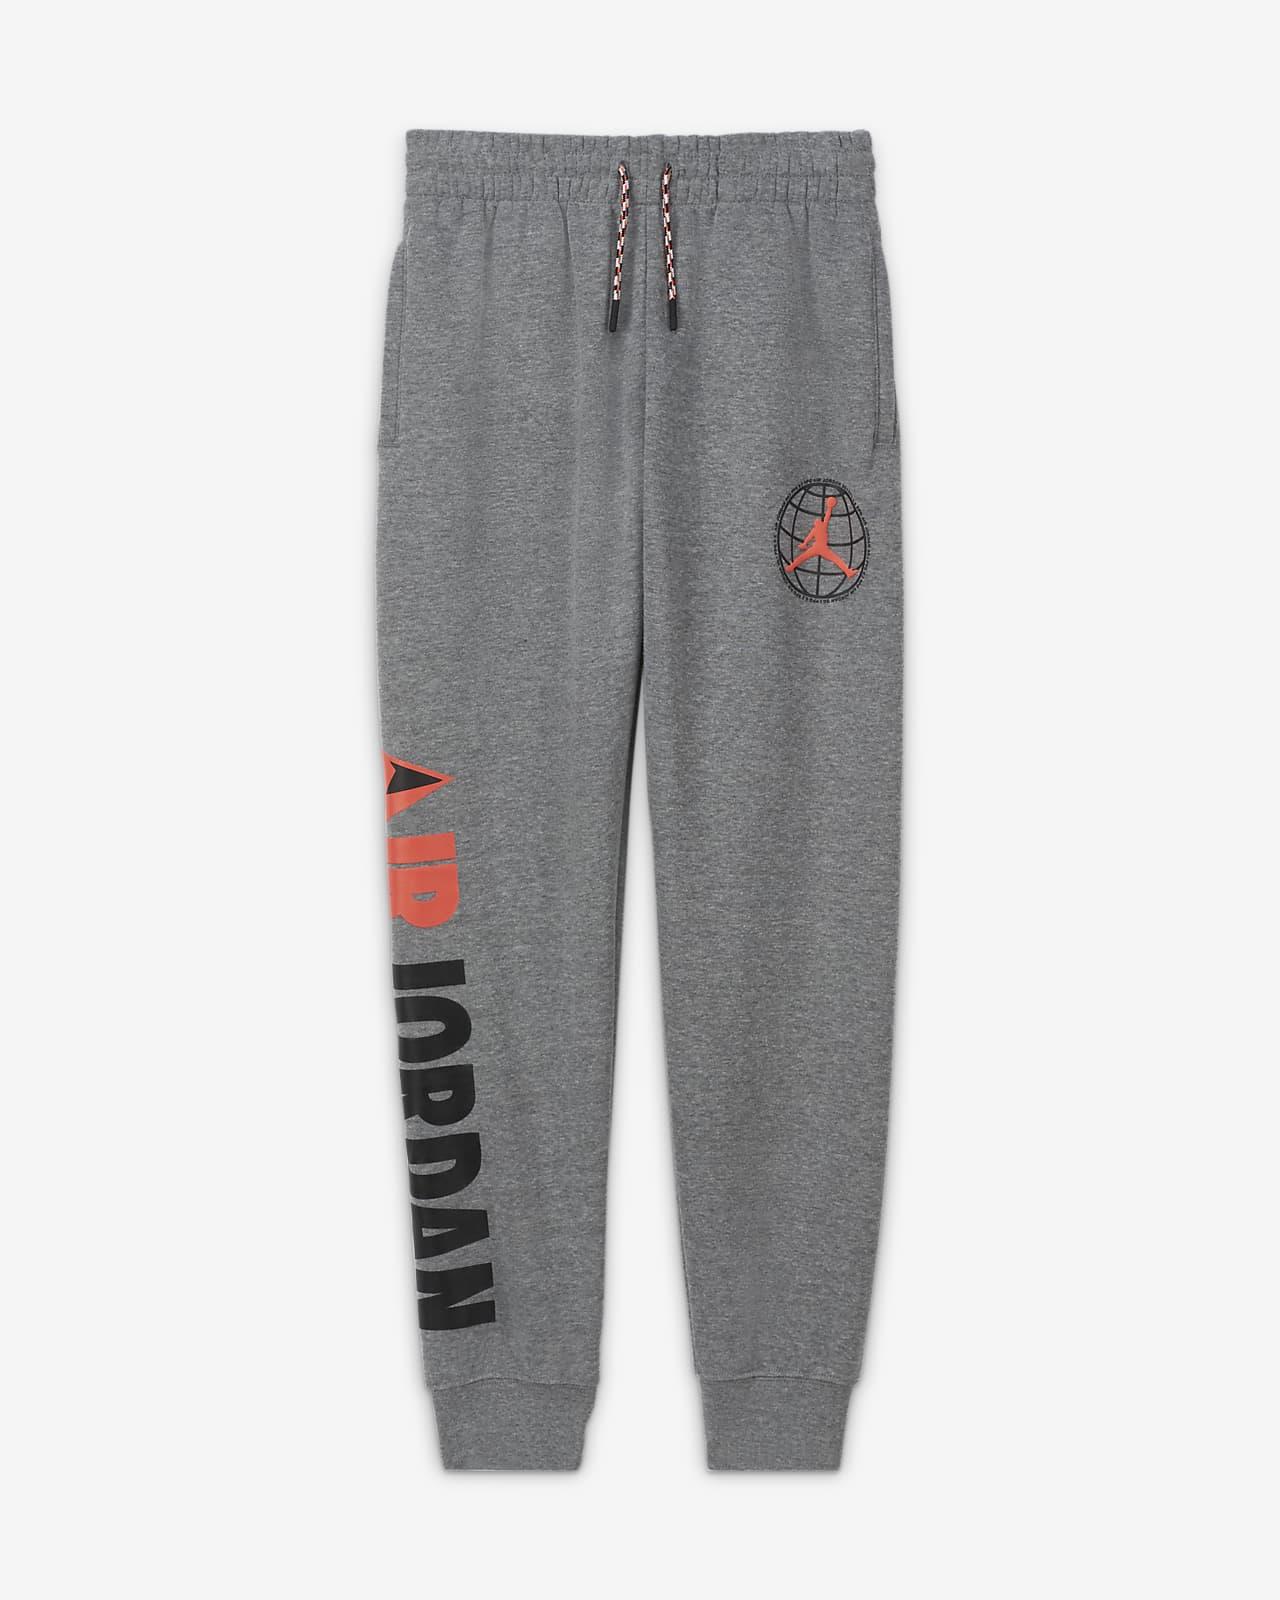 Jordan Older Kids' (Boys') Fleece Trousers